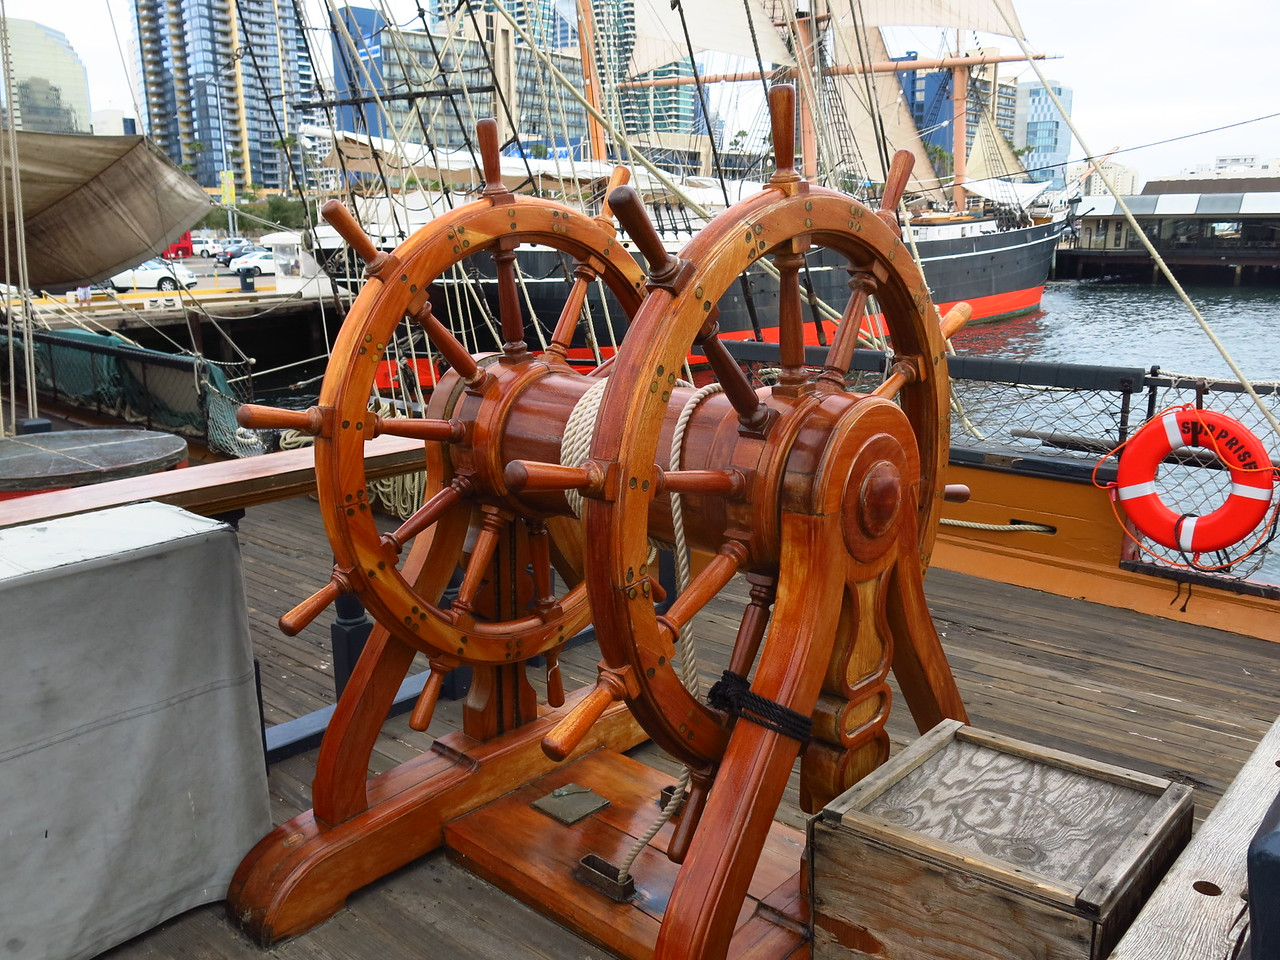 2016-06-07 Maritime (99)